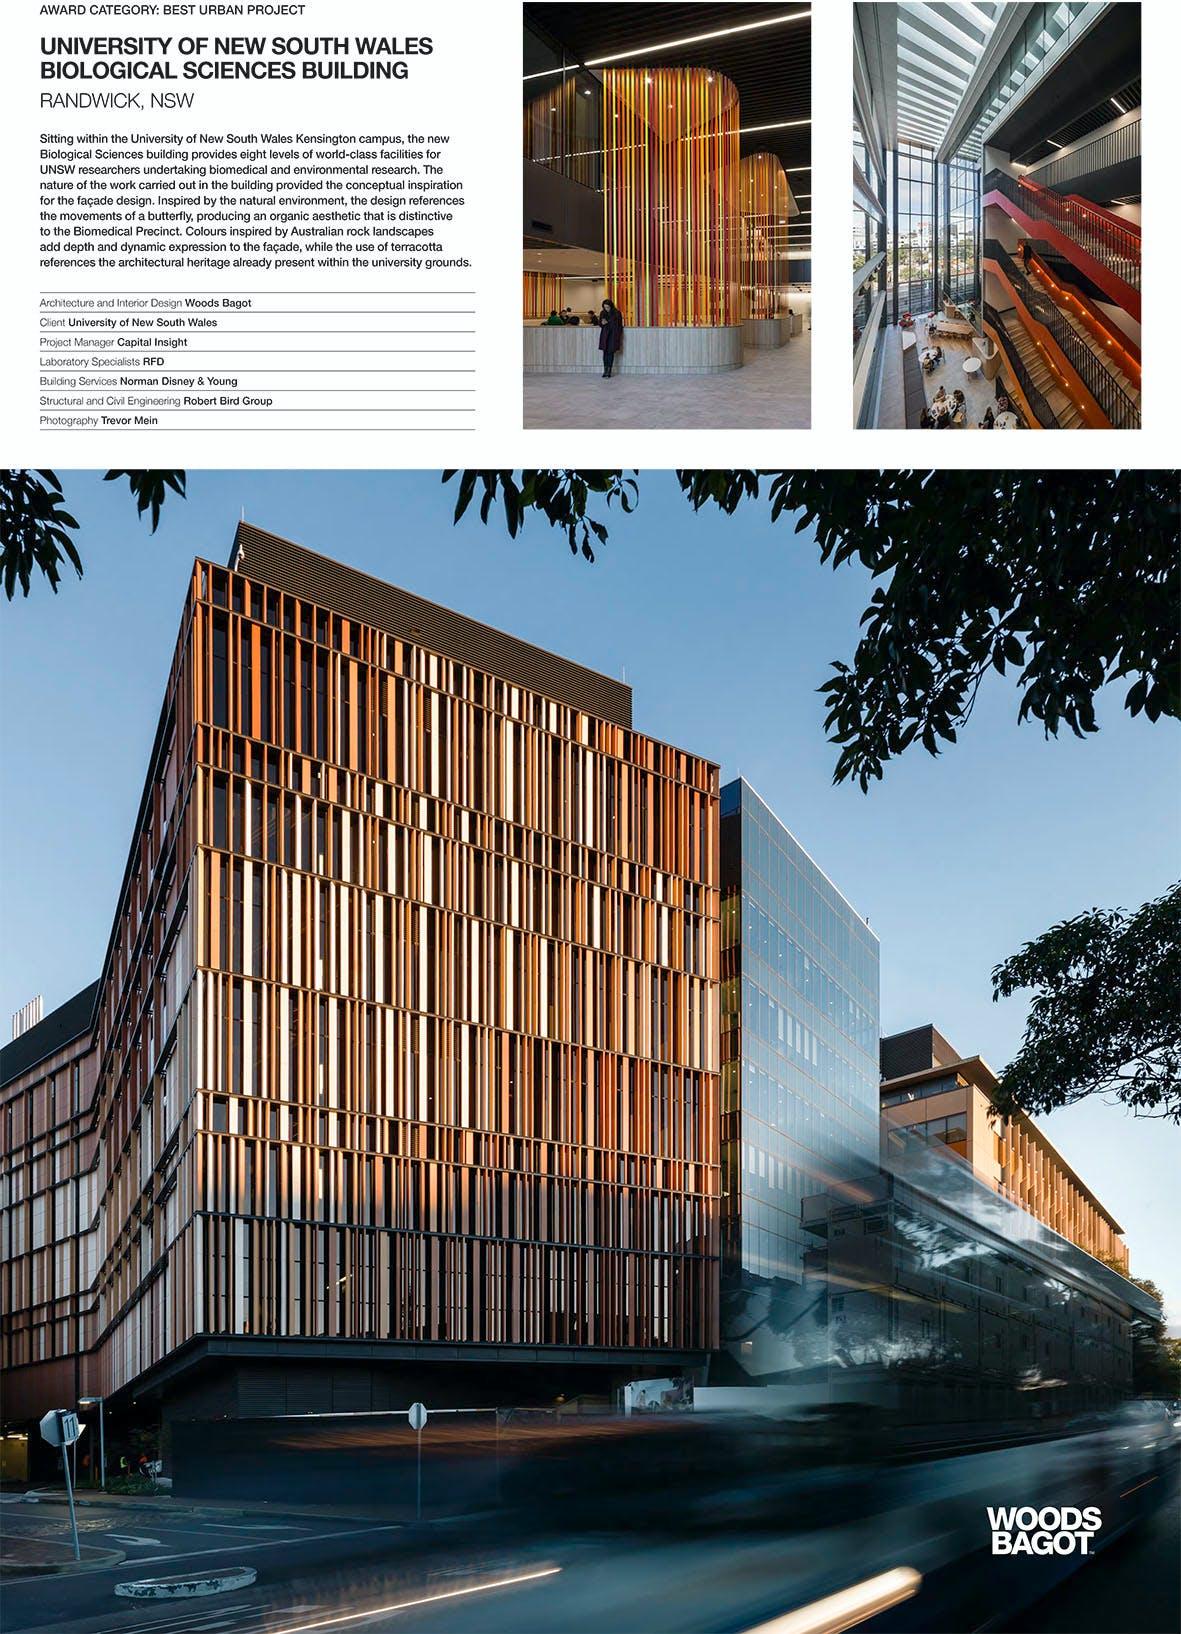 Unsw Biological Sciences Building